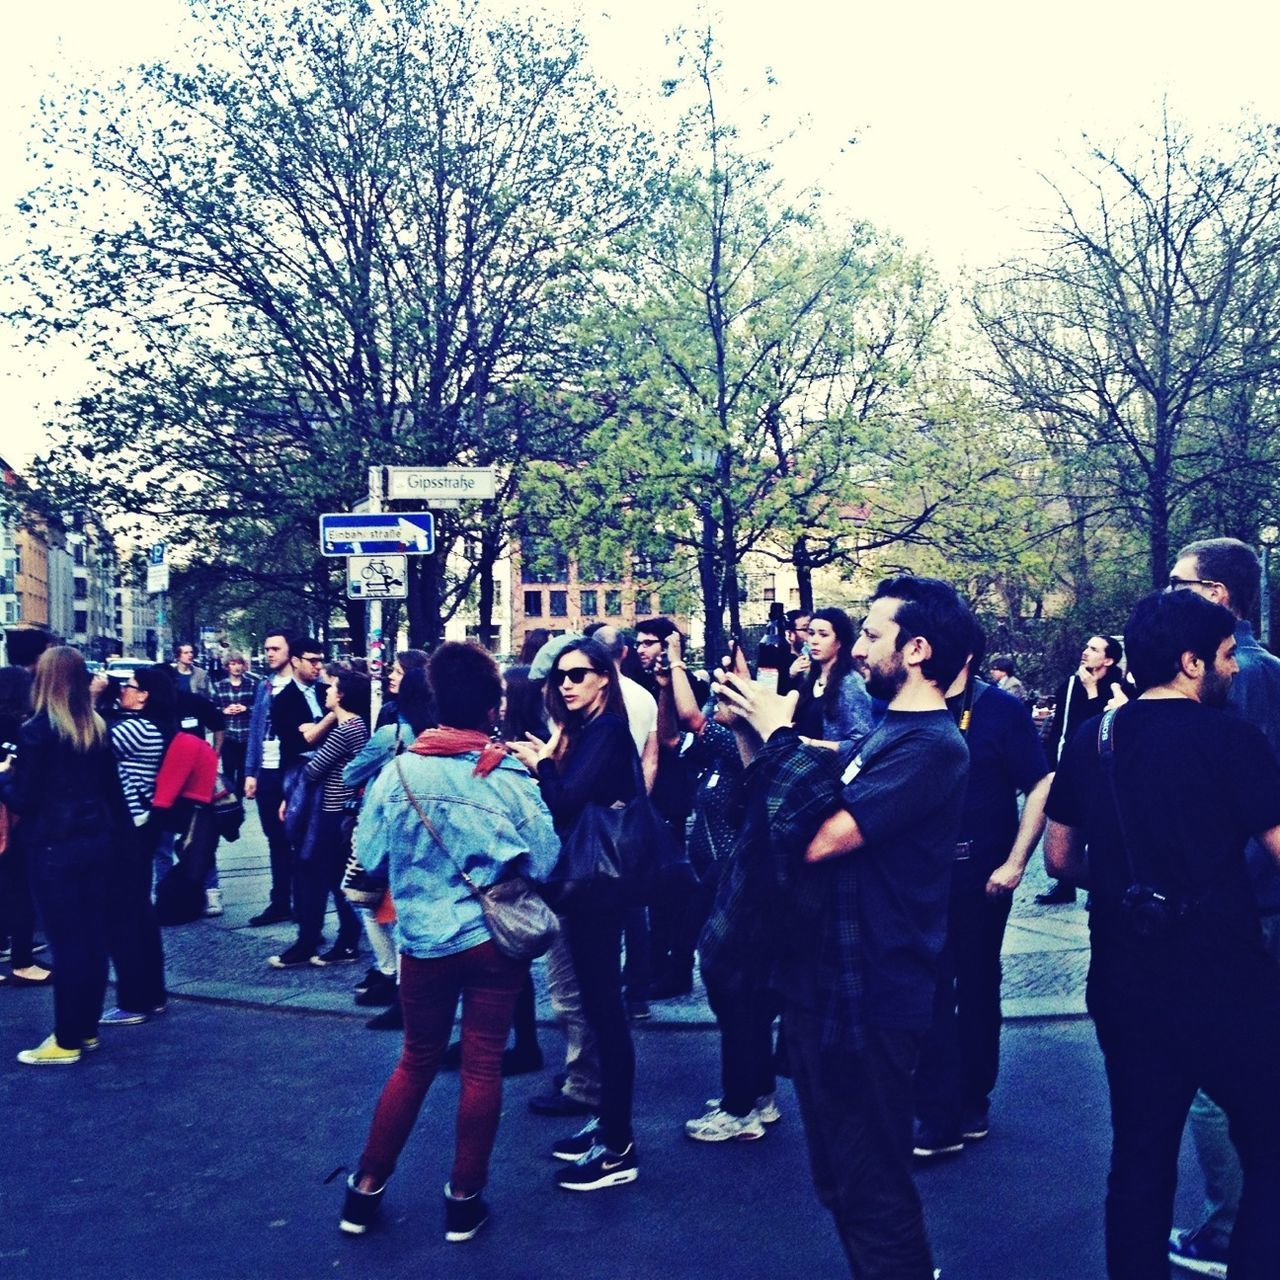 PEOPLE LOOKING AT CITY STREET